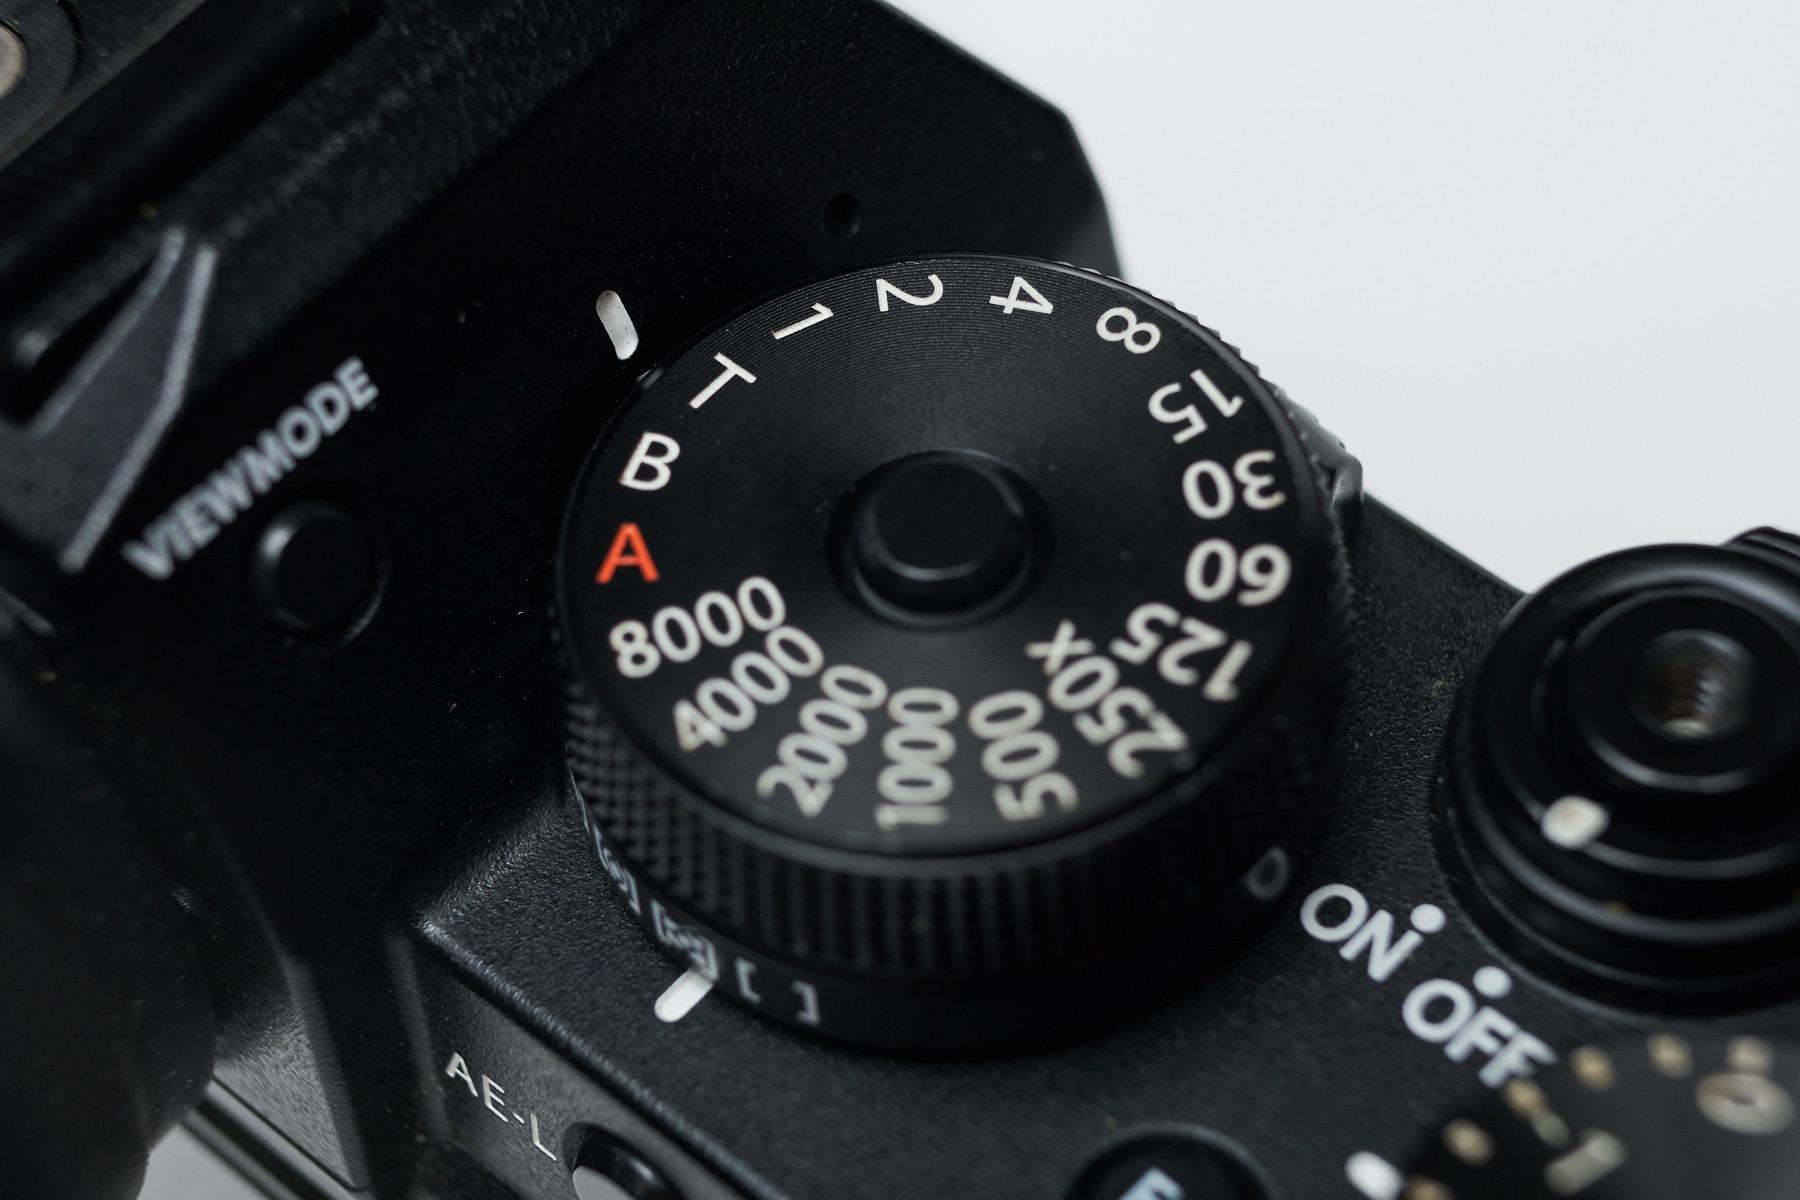 Fujifilm Shutter Speed Dial T